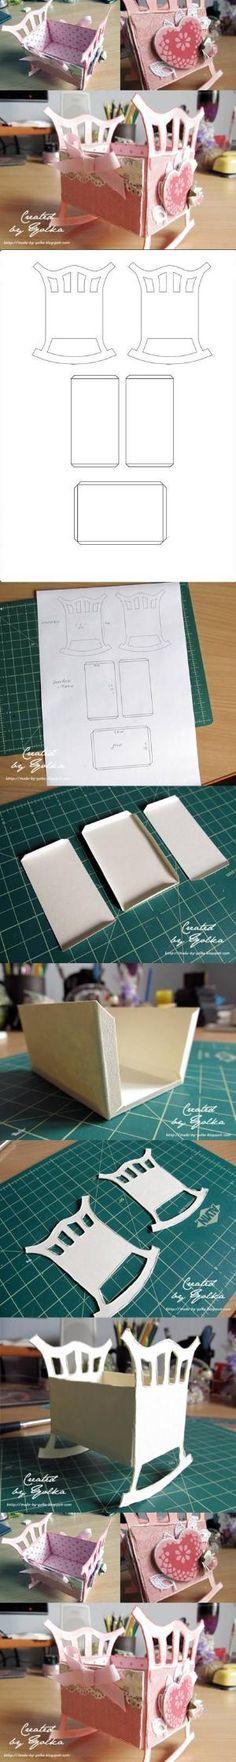 DIY Paper Crib DIY Paper Crib by diyforever